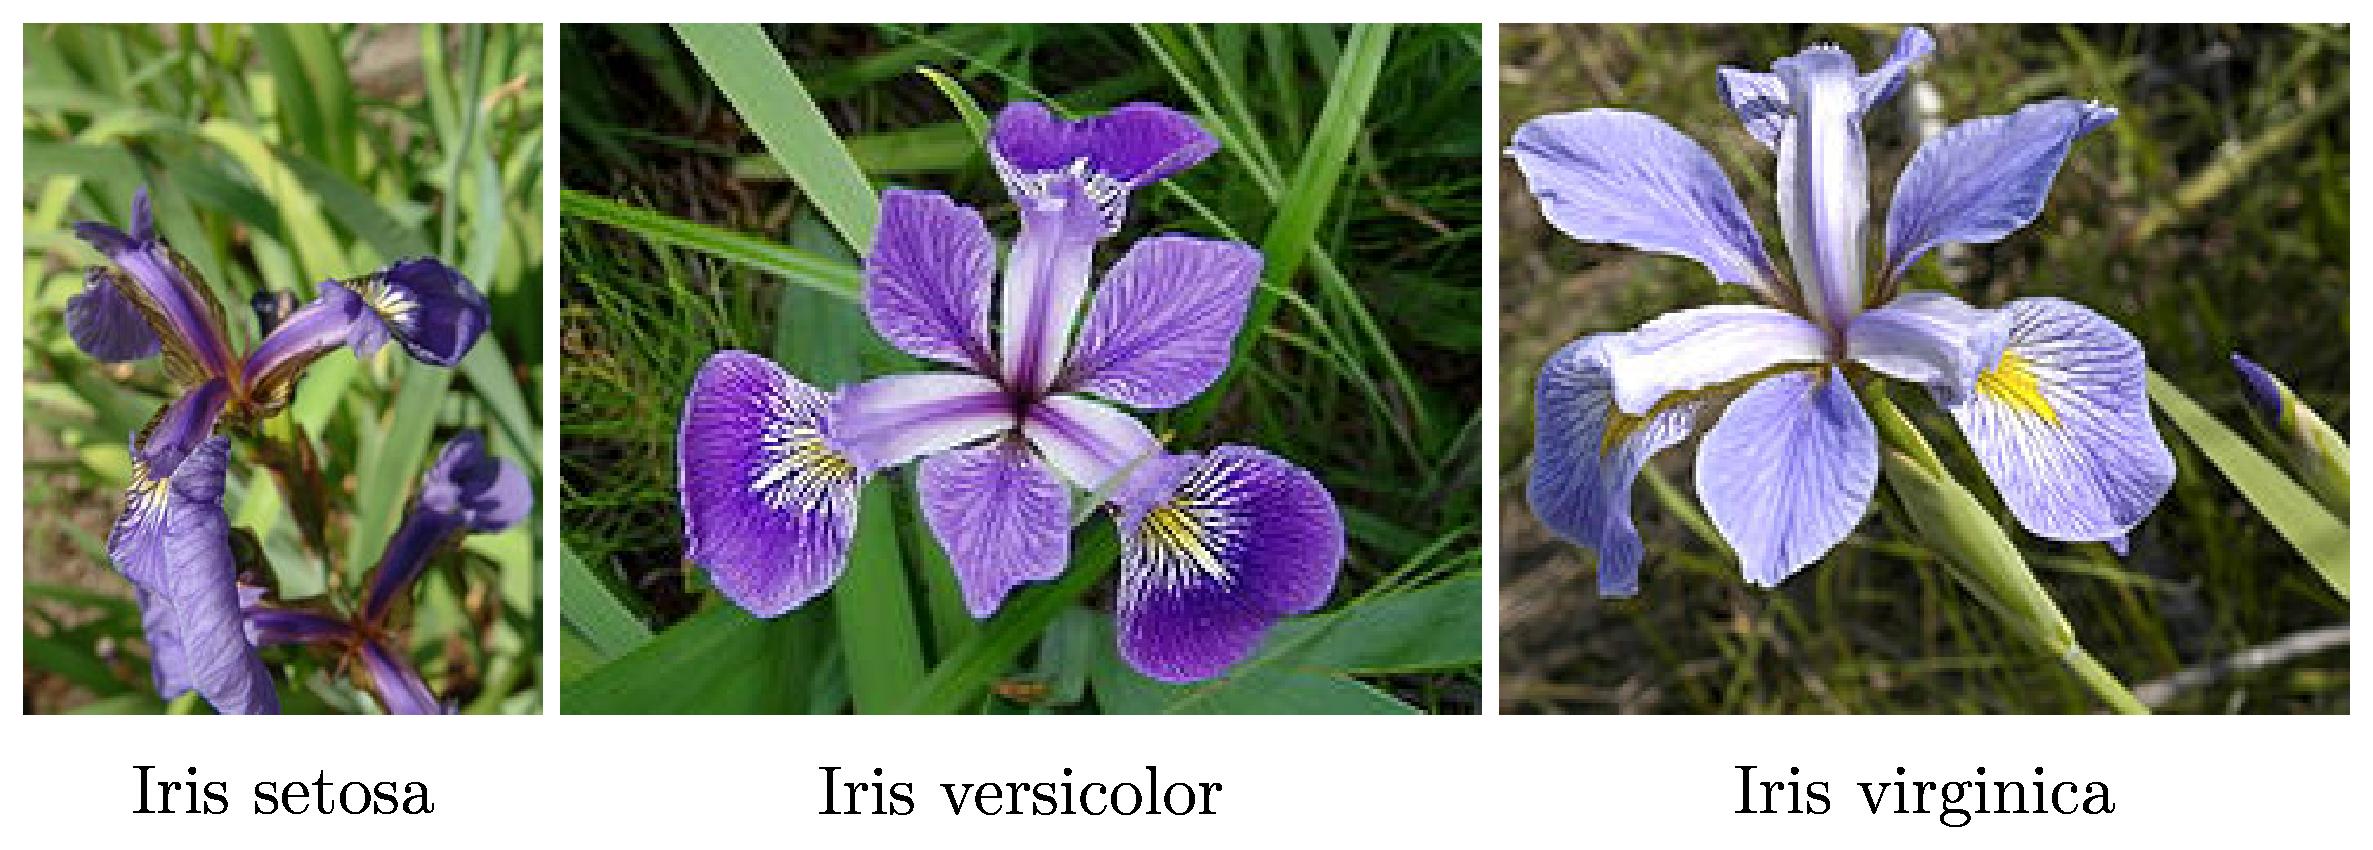 Iris flower data set image collections flower wallpaper hd iris flower dataset images flower wallpaper hd iris flower dataset gallery flower wallpaper hd machine learning izmirmasajfo